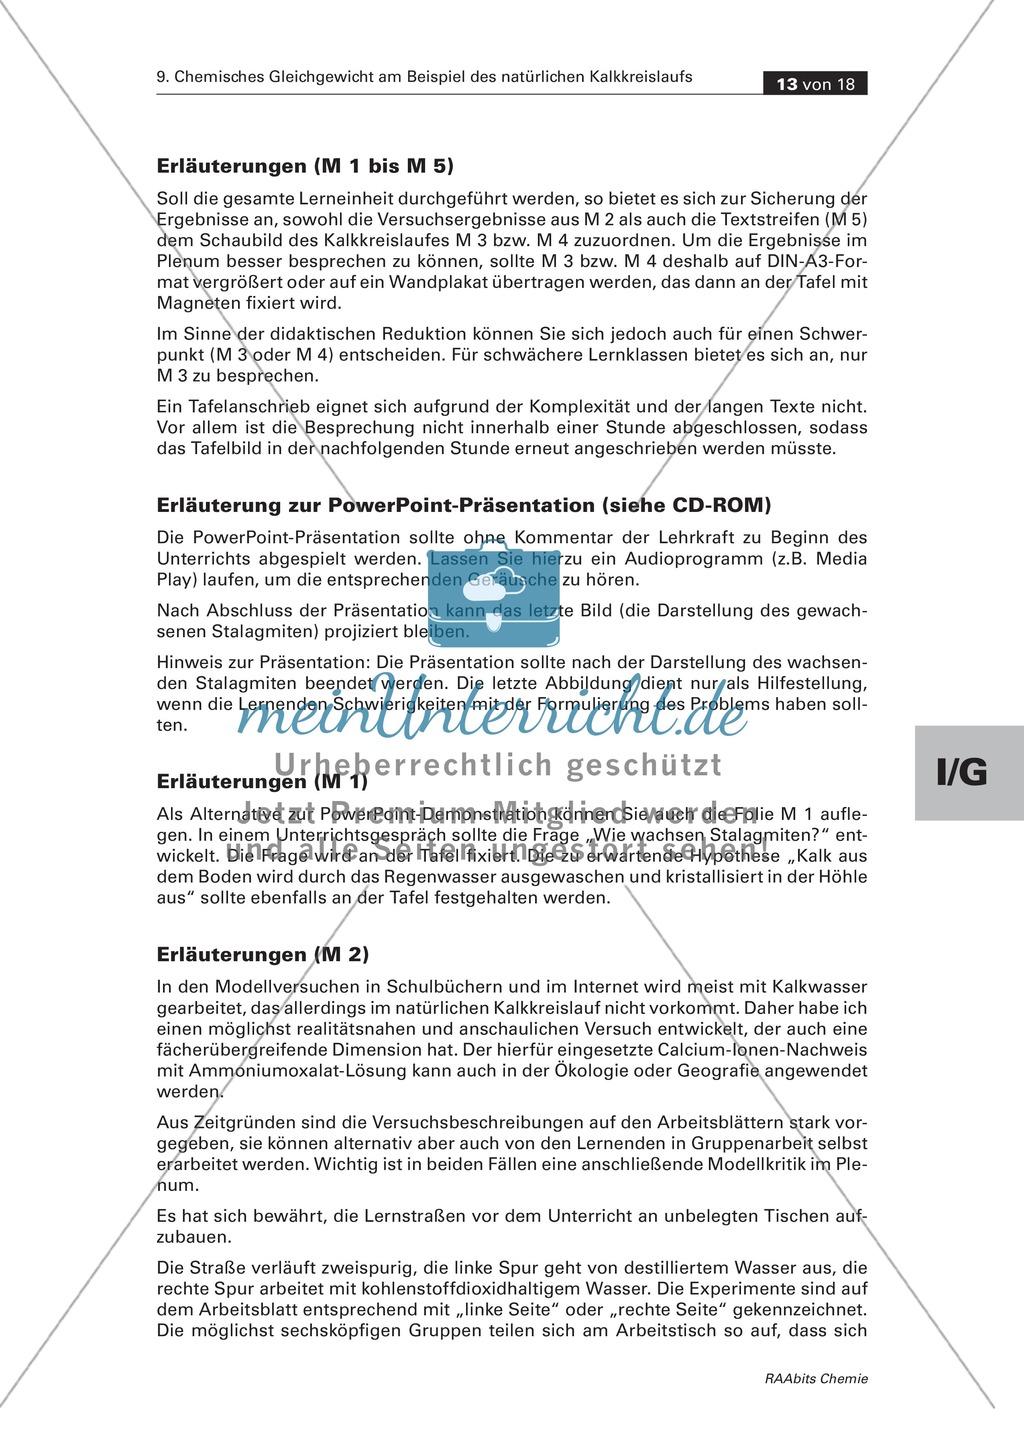 Famous Chemie Arbeitsblatt Grad 10 Model - Kindergarten Arbeitsblatt ...